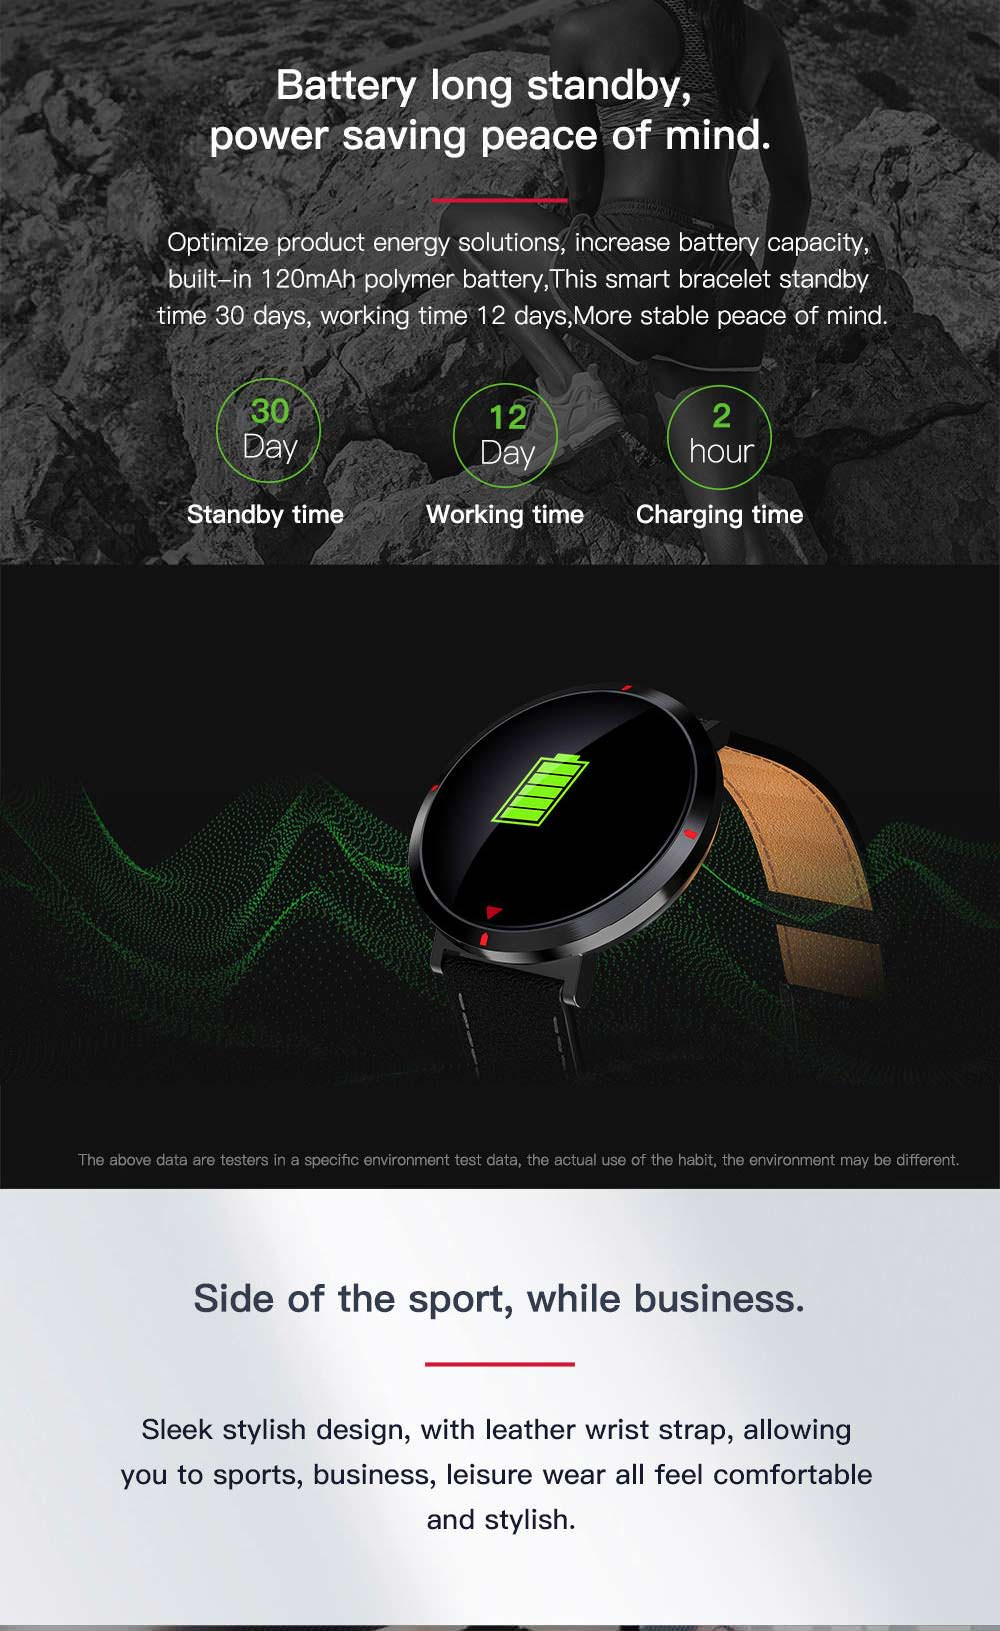 goral s2 pro smartwatch 2019